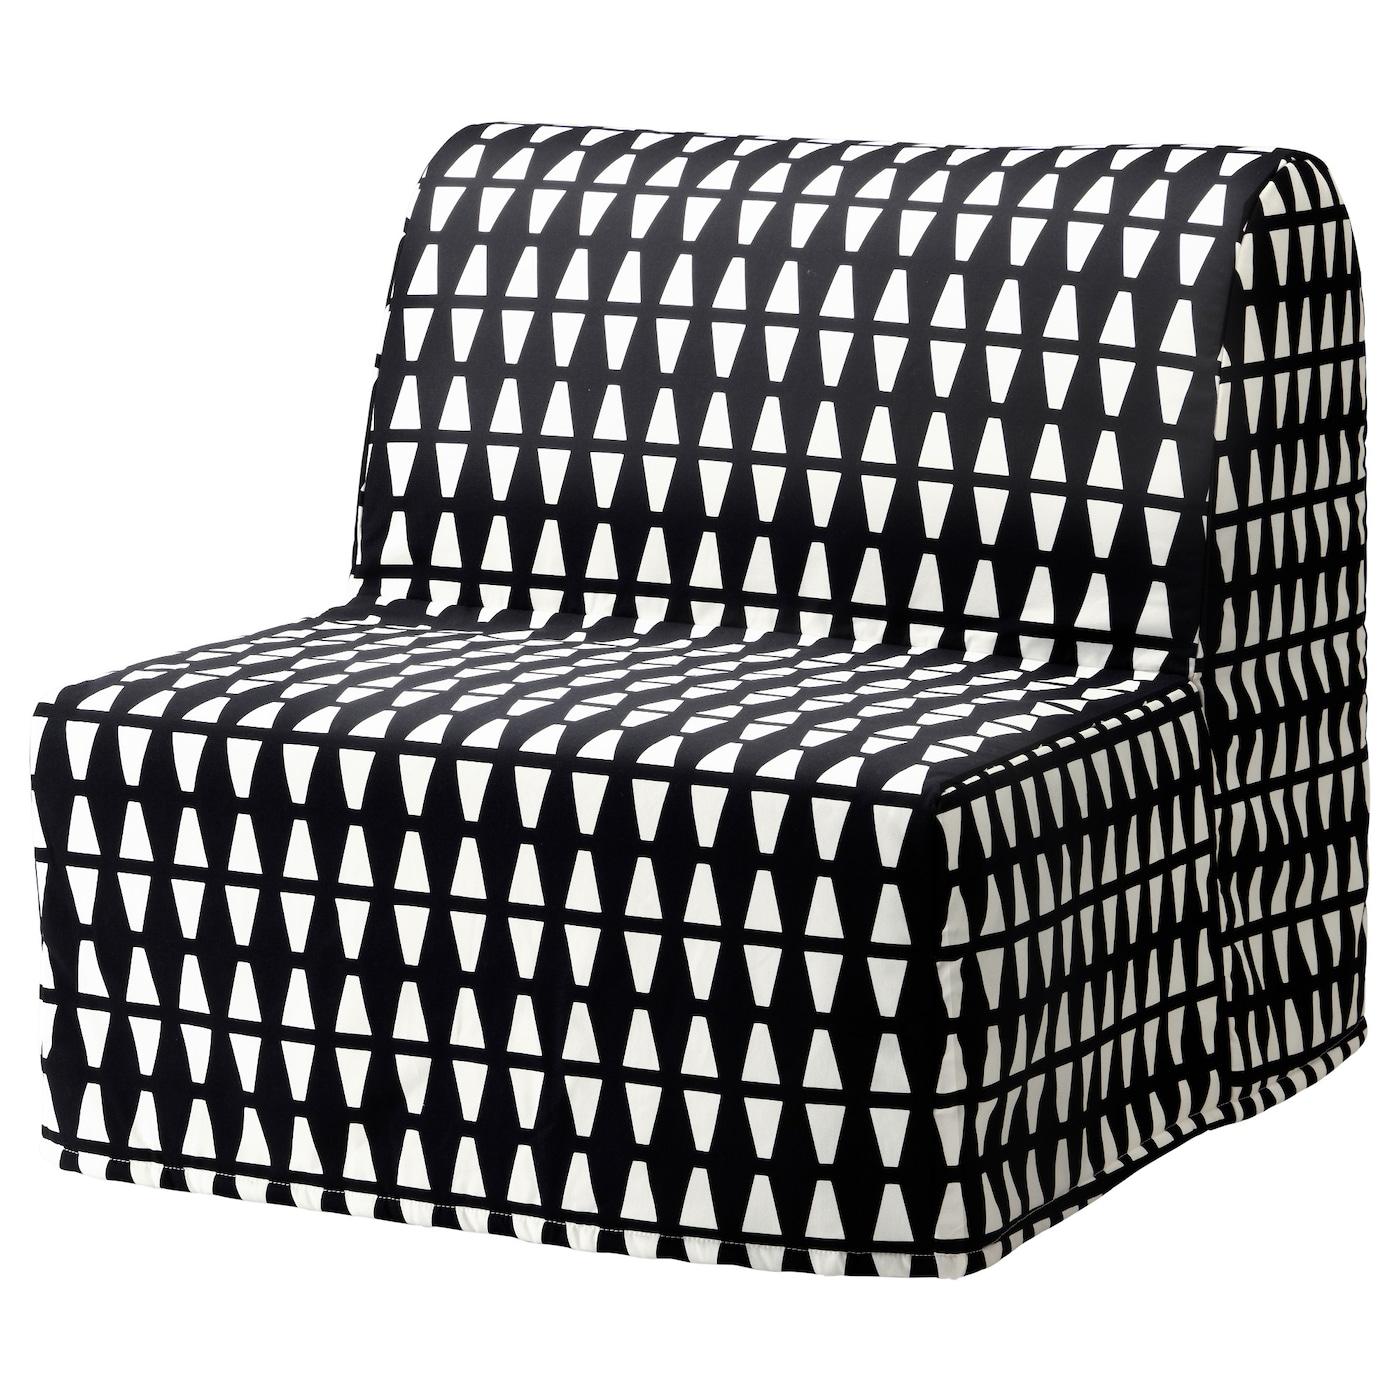 Lycksele Lovas Ebbarp Black White Chair Bed Ikea